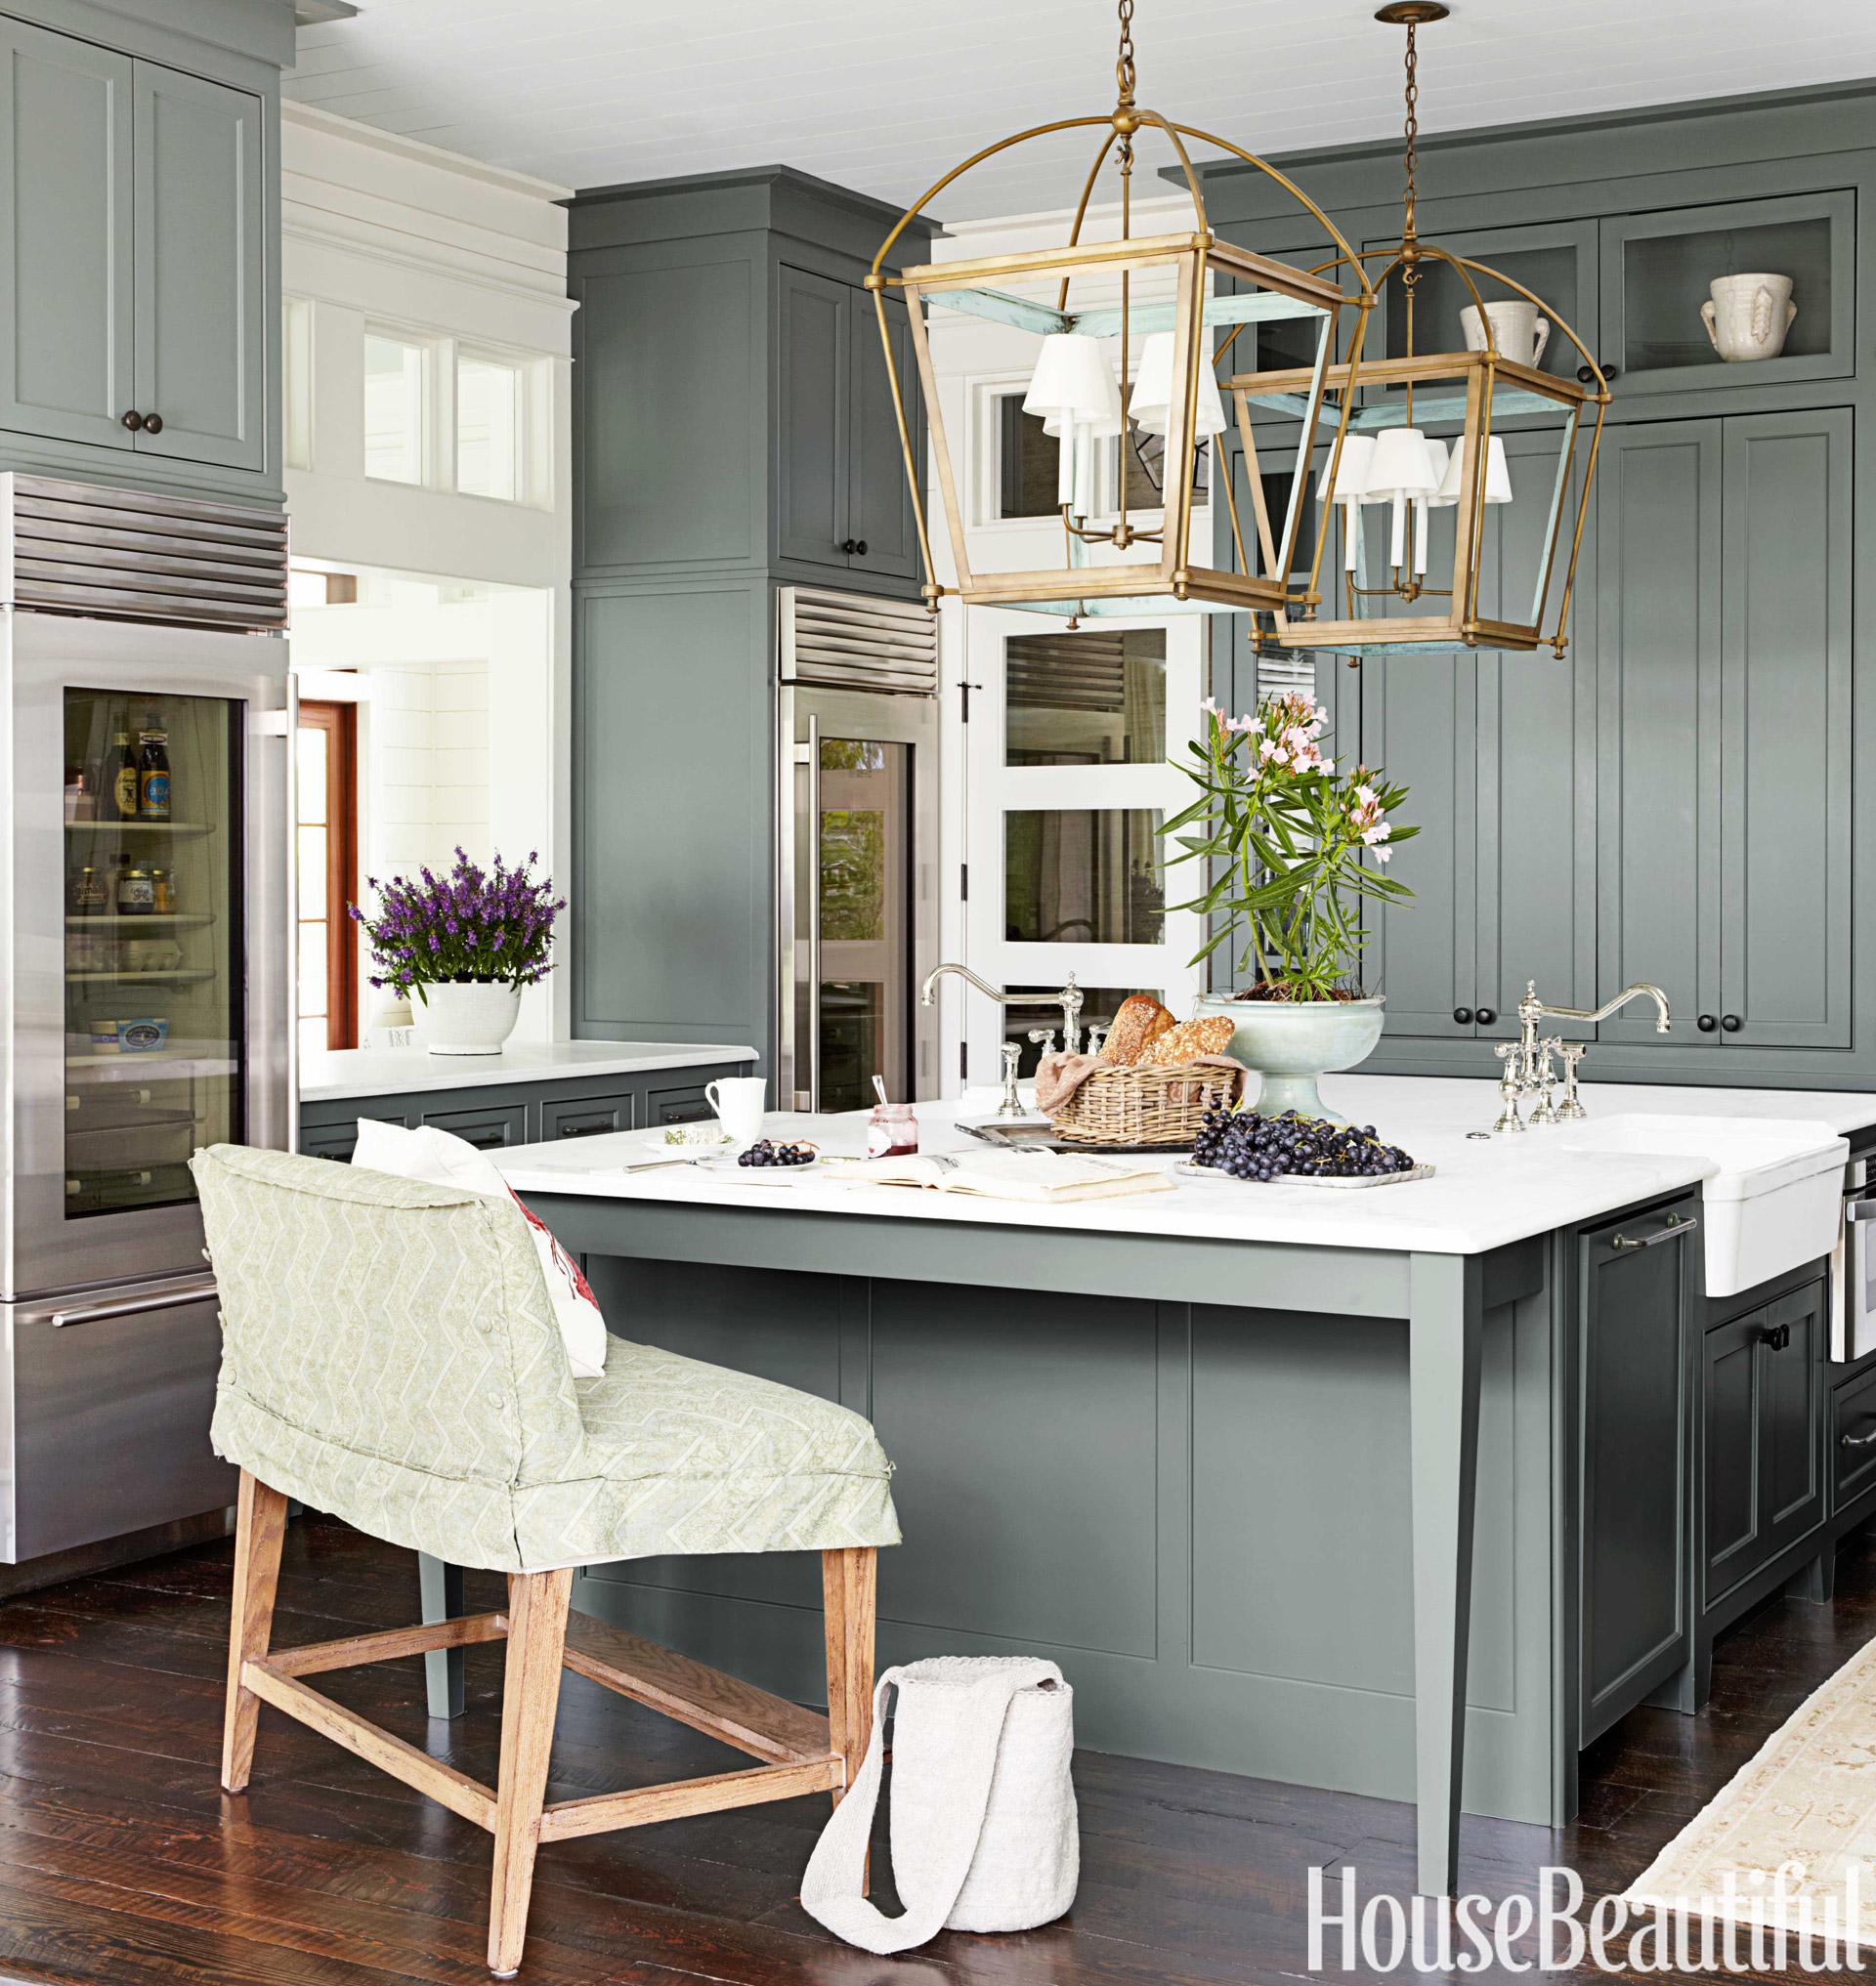 Ocean Inspired Kitchen  Urban Grace Interiors Kitchen